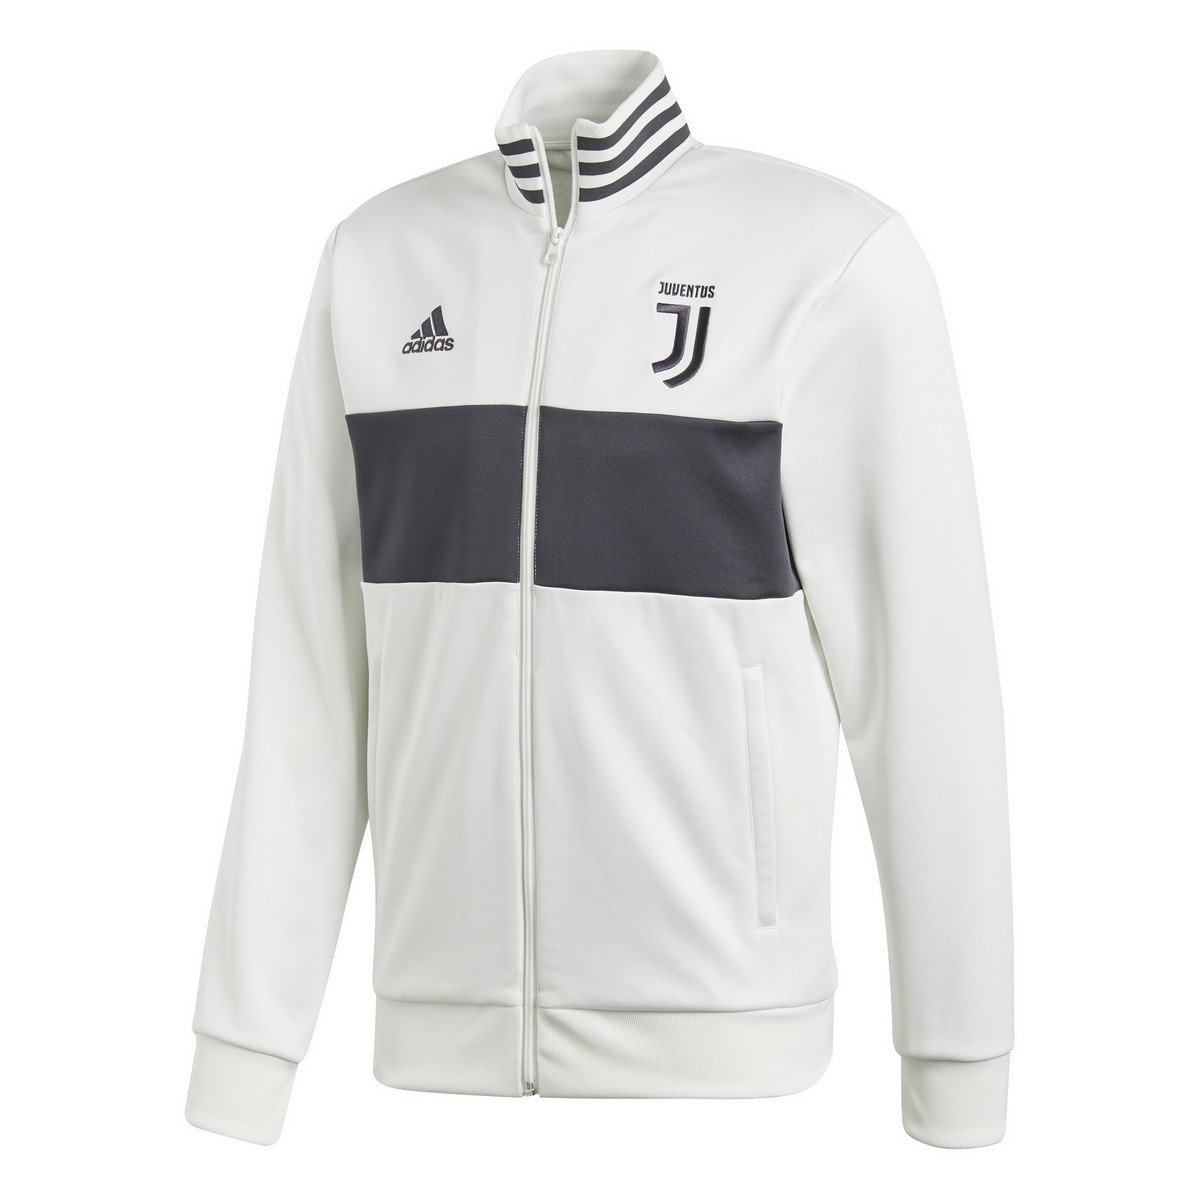 Juventus 3 201718 Felpa Bianca Track Top Stripes Adidas T1P7q8Twx